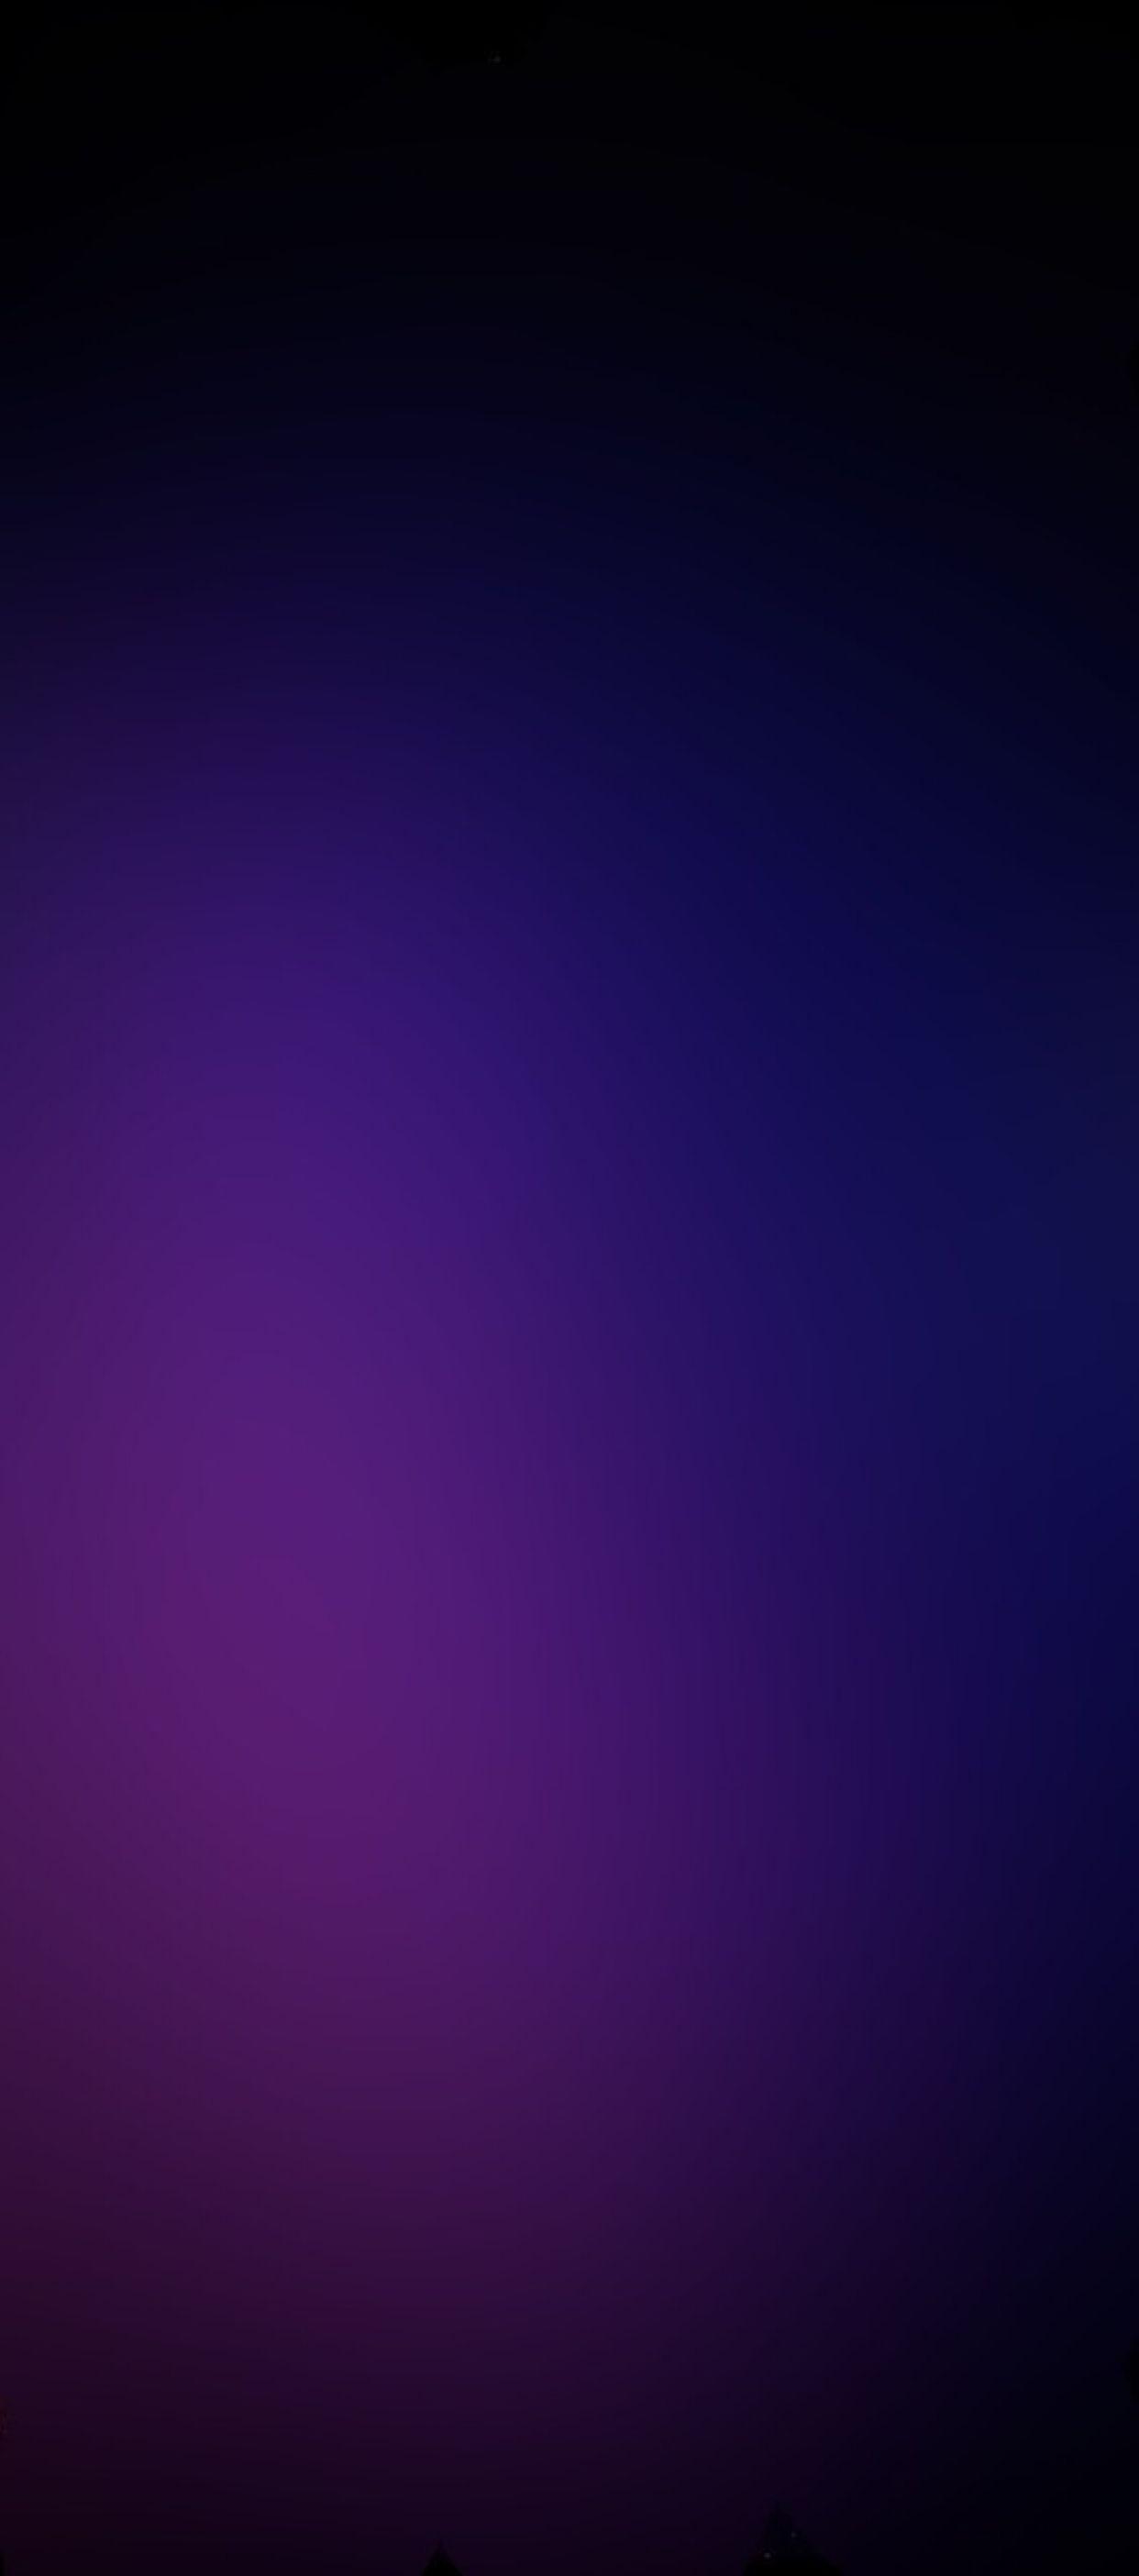 b5f29ec1e7b443 Purple, wallpaper, clean, galaxy, colour, abstract, digital art, s8, walls,  Samsung, galaxy s8